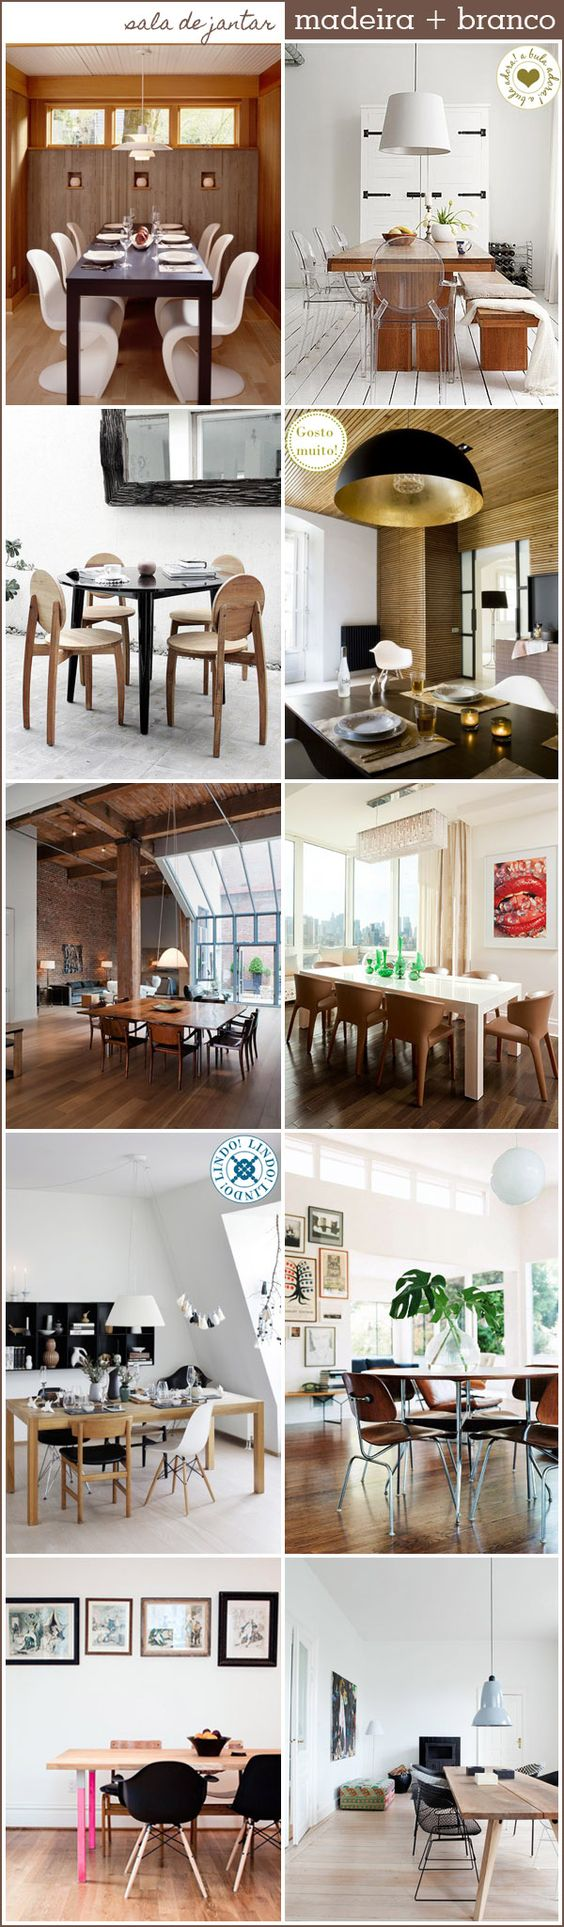 sala-de-jantar-madeira-branco-decor